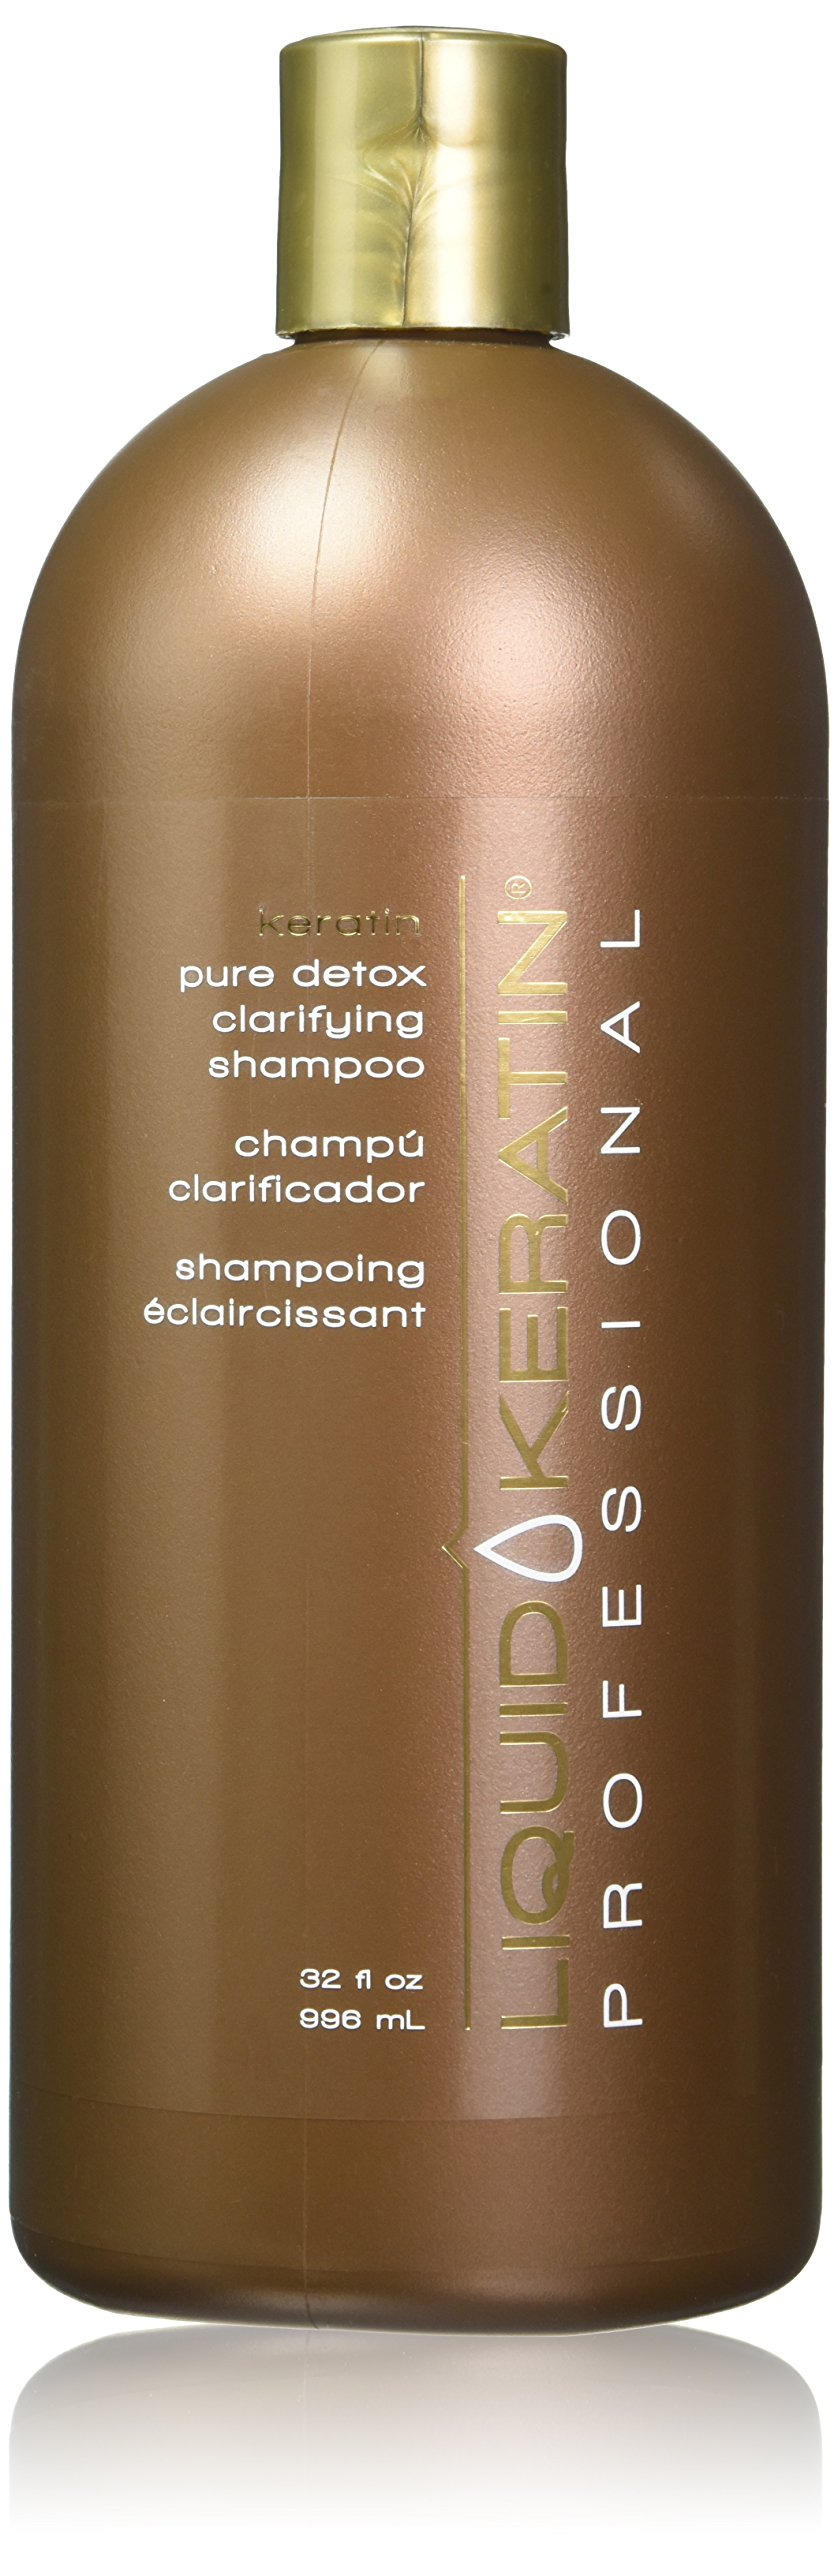 Liquid Keratin Professional Pure Detox Clarifying Shampoo, 32 Ounce